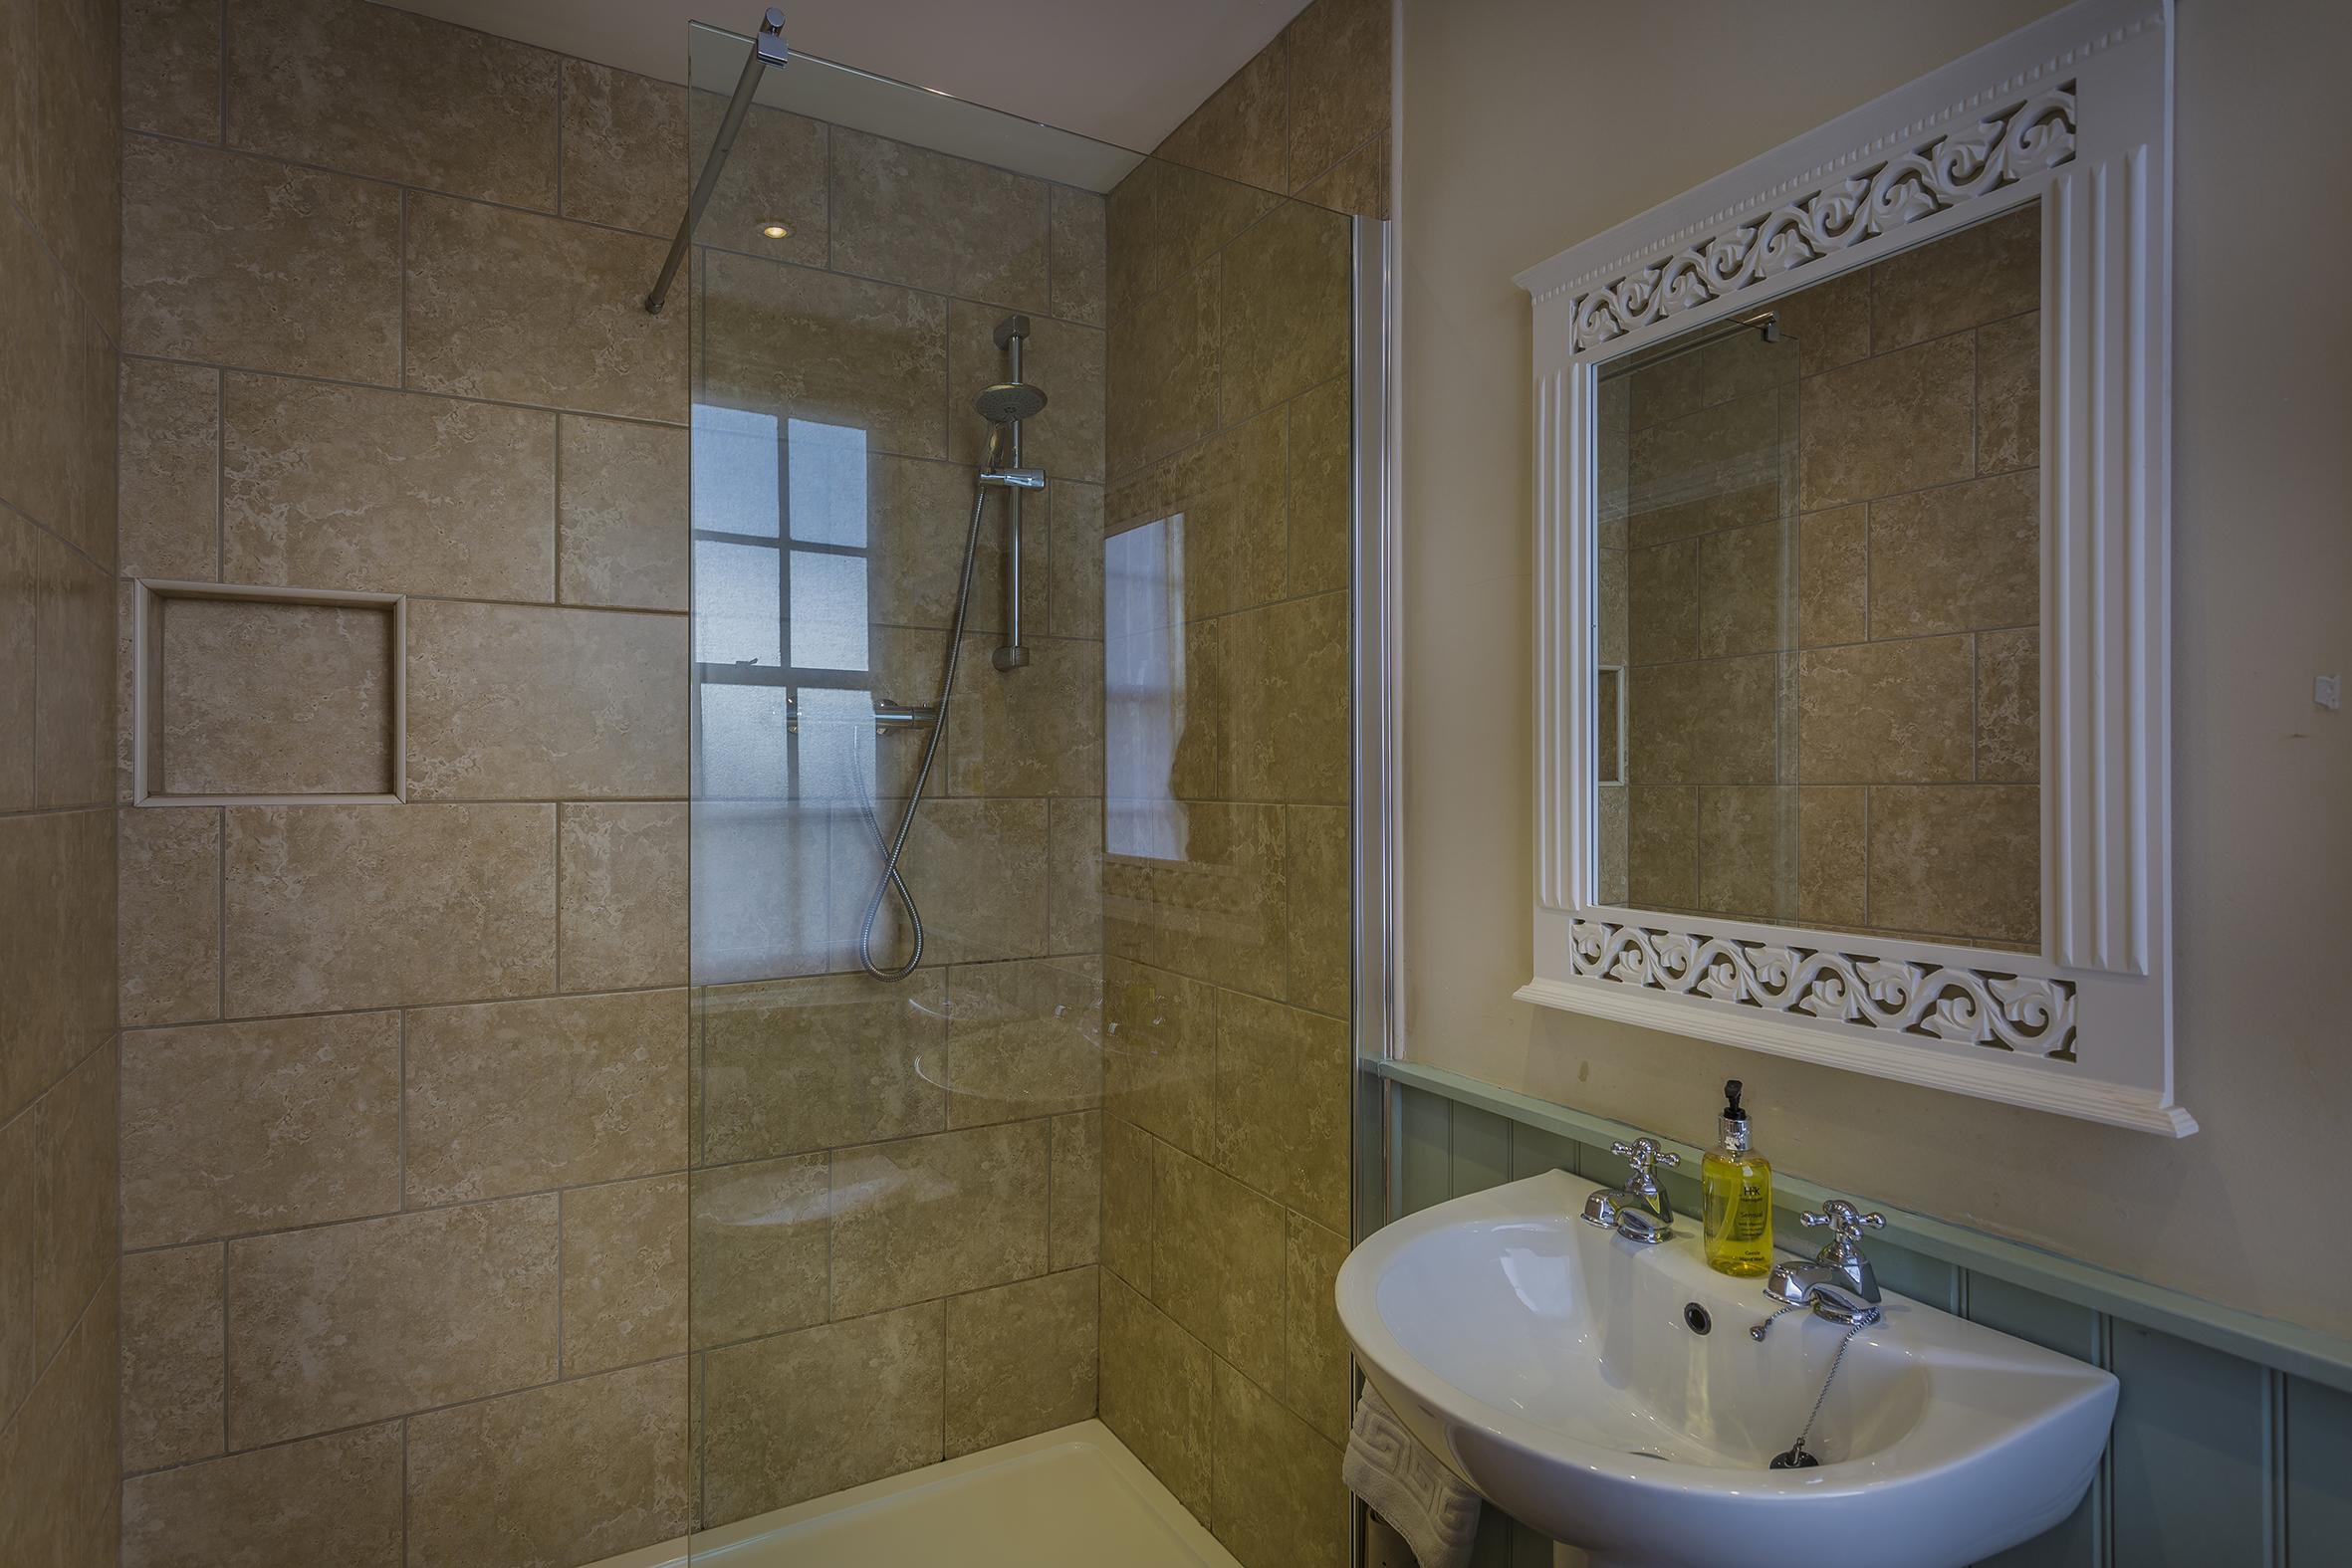 Golden Fleece Superior Double Bathroom Alternate 1.jpg